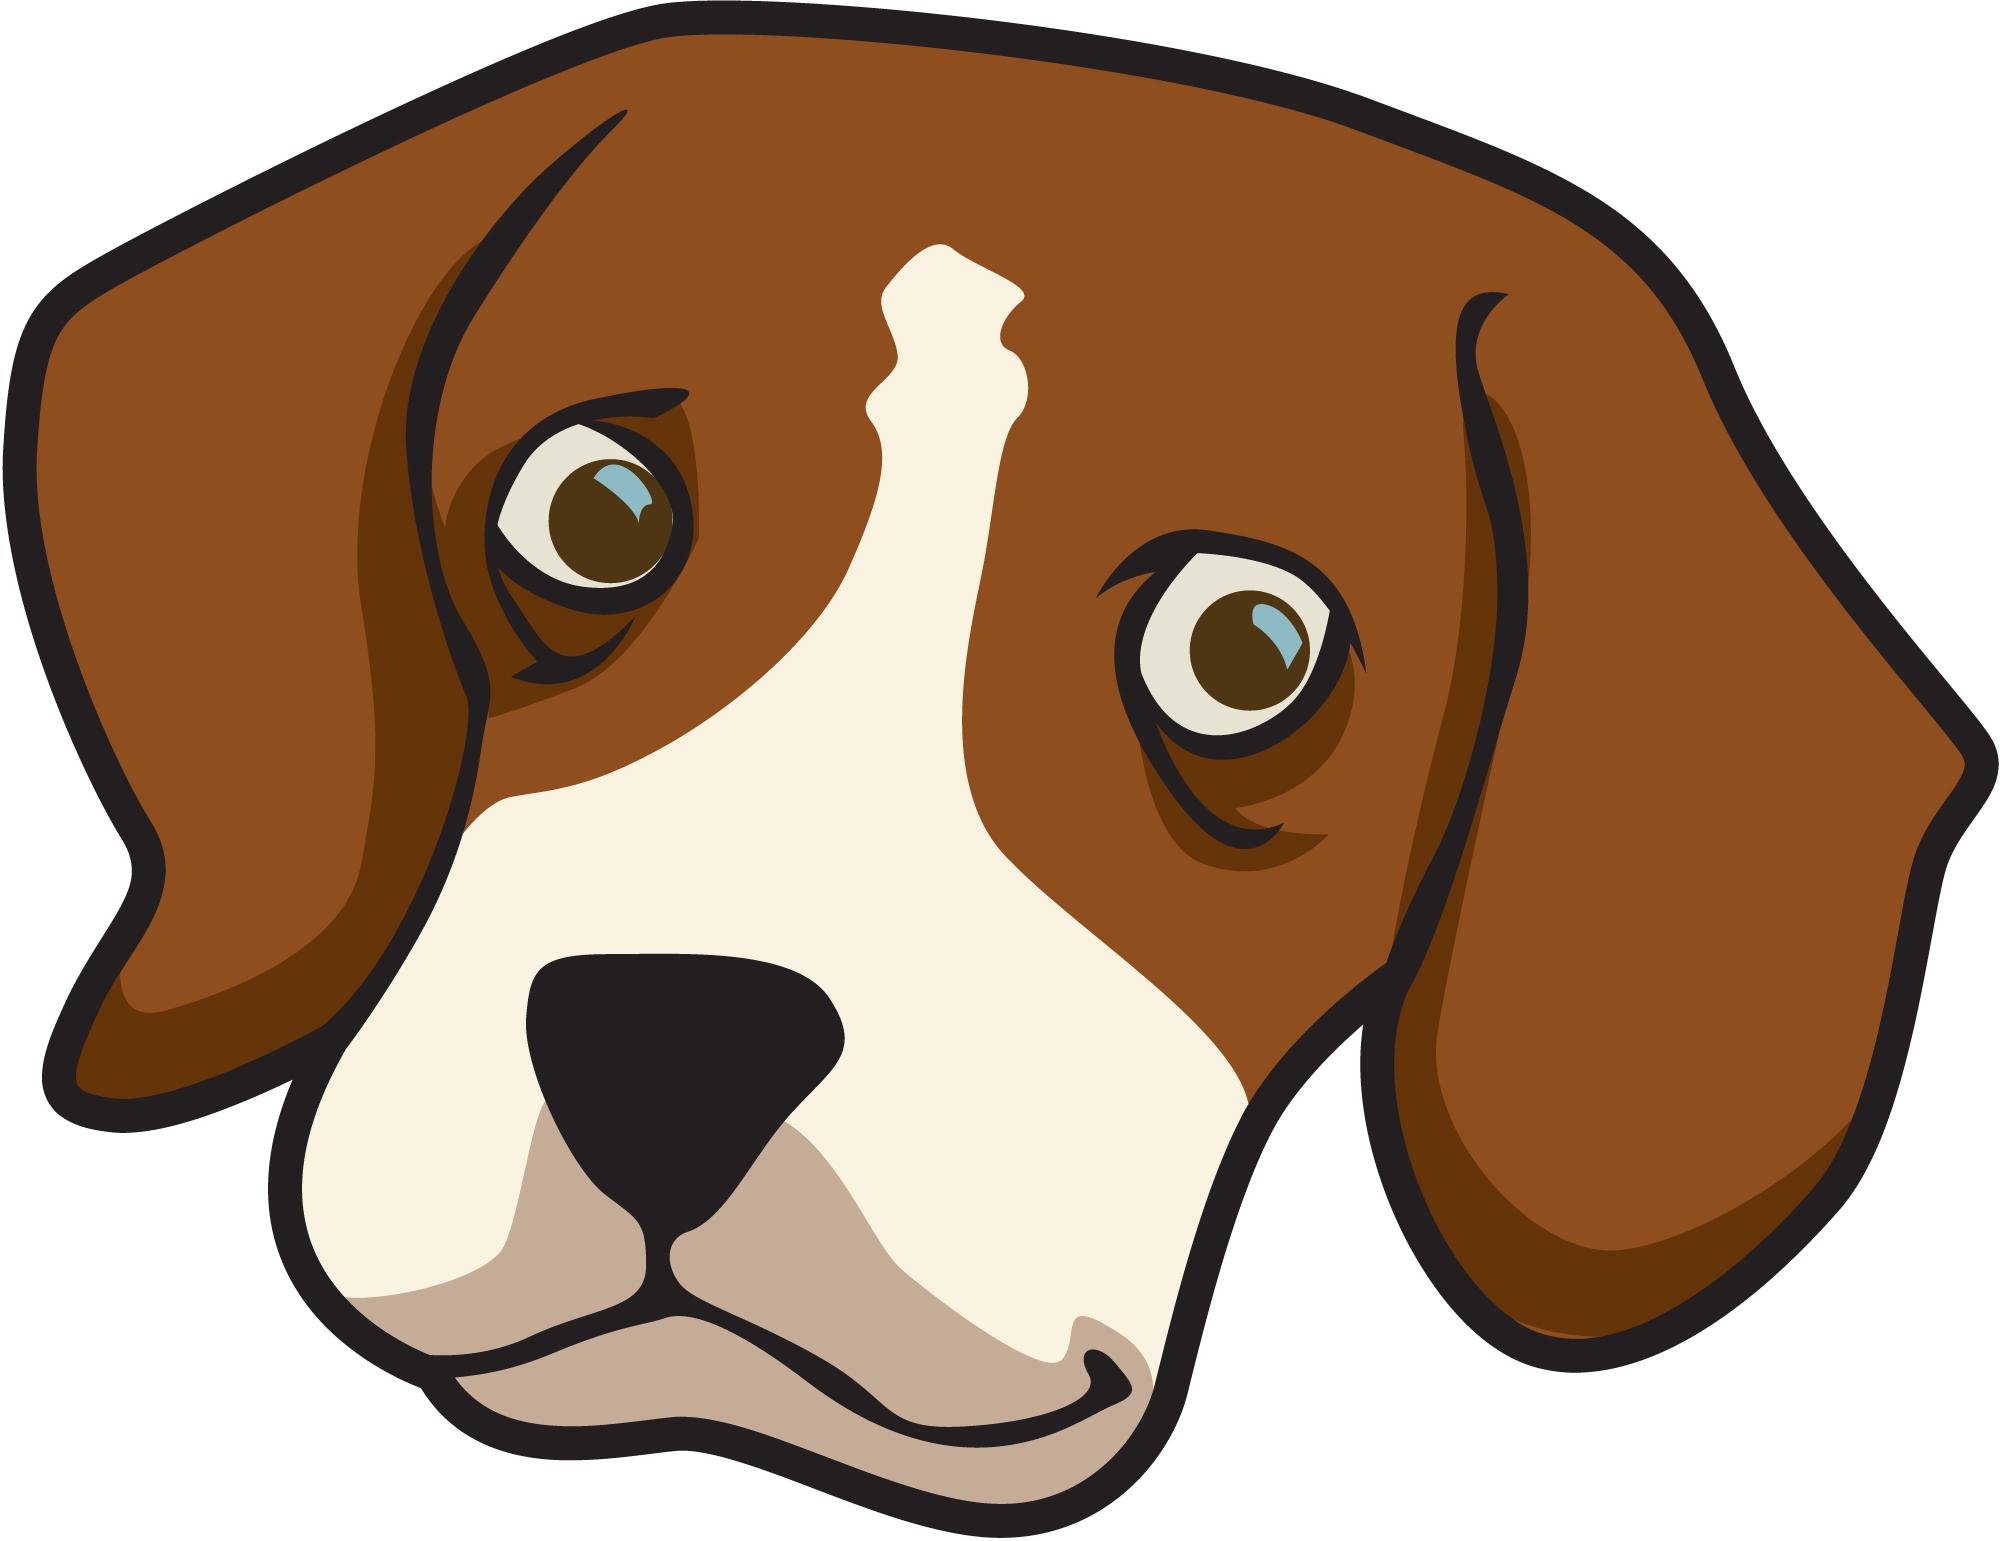 dog face clipart rh clipart info sad dog face clipart puppy dog face clipart